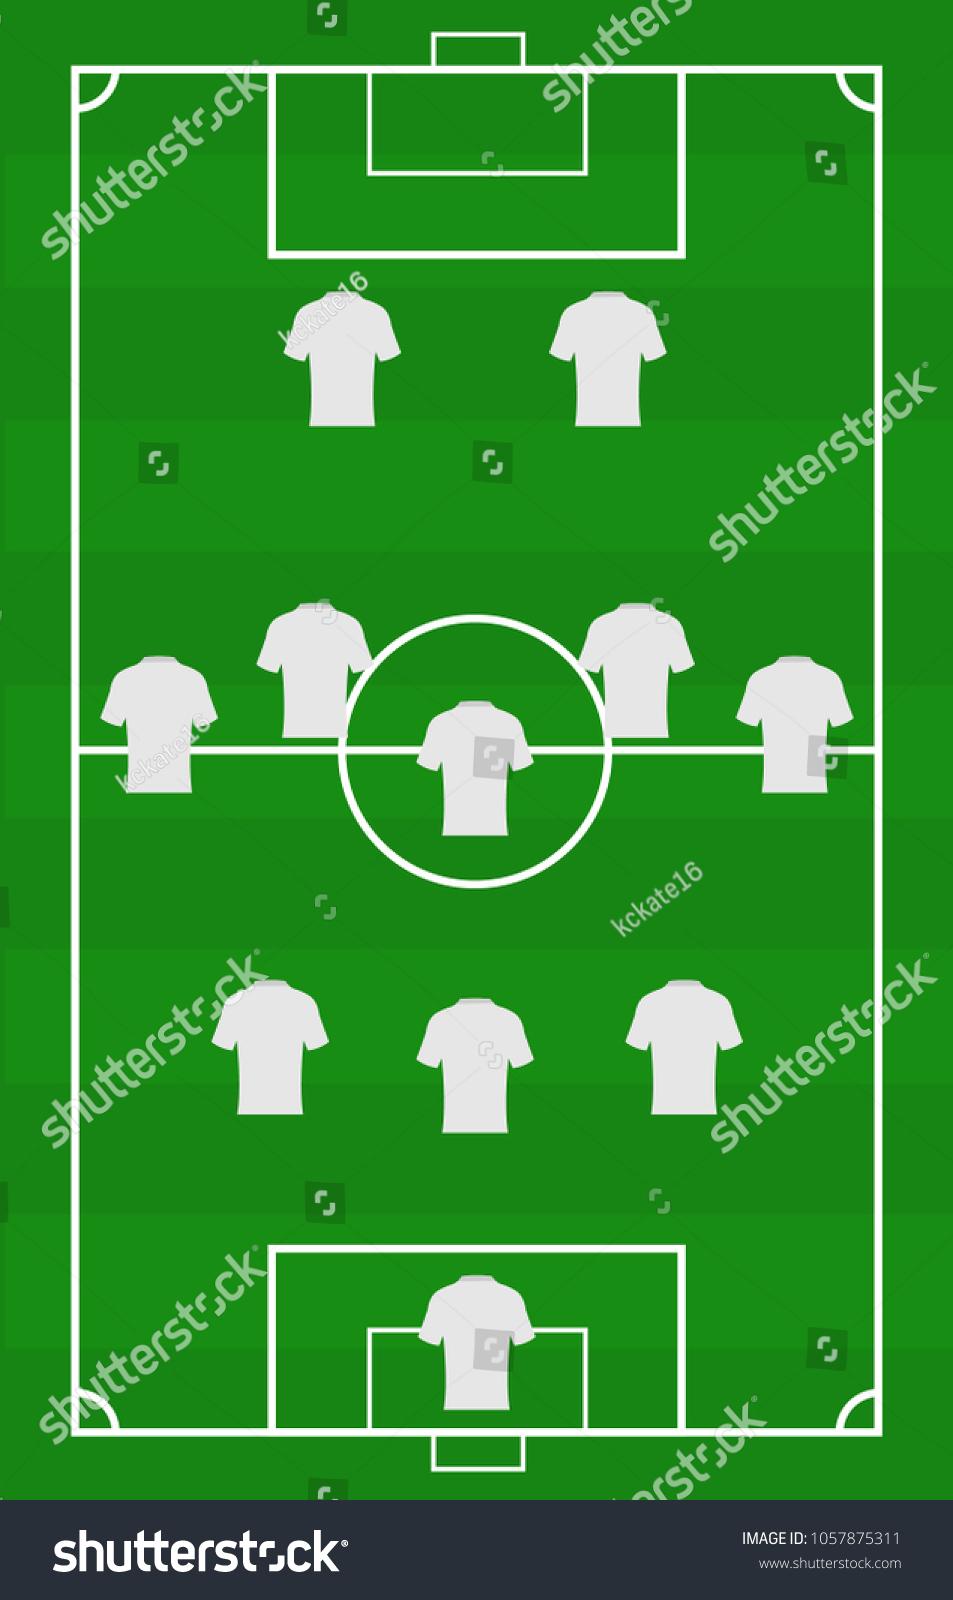 Vector Soccer Field Arrangement Players Game Position Stock Vector